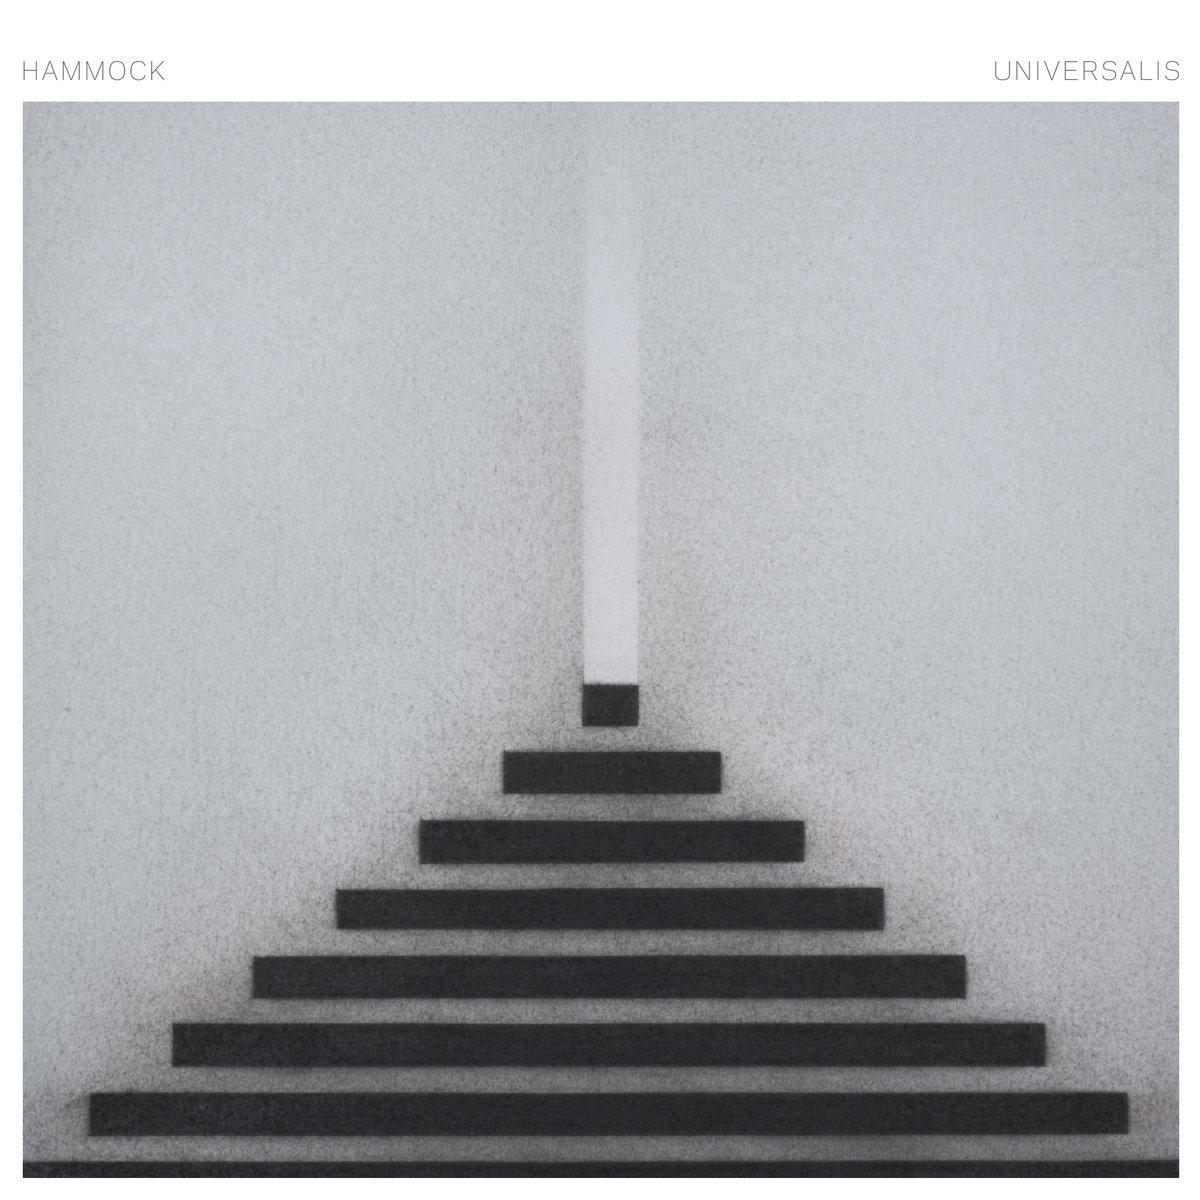 Universalis | Hammock